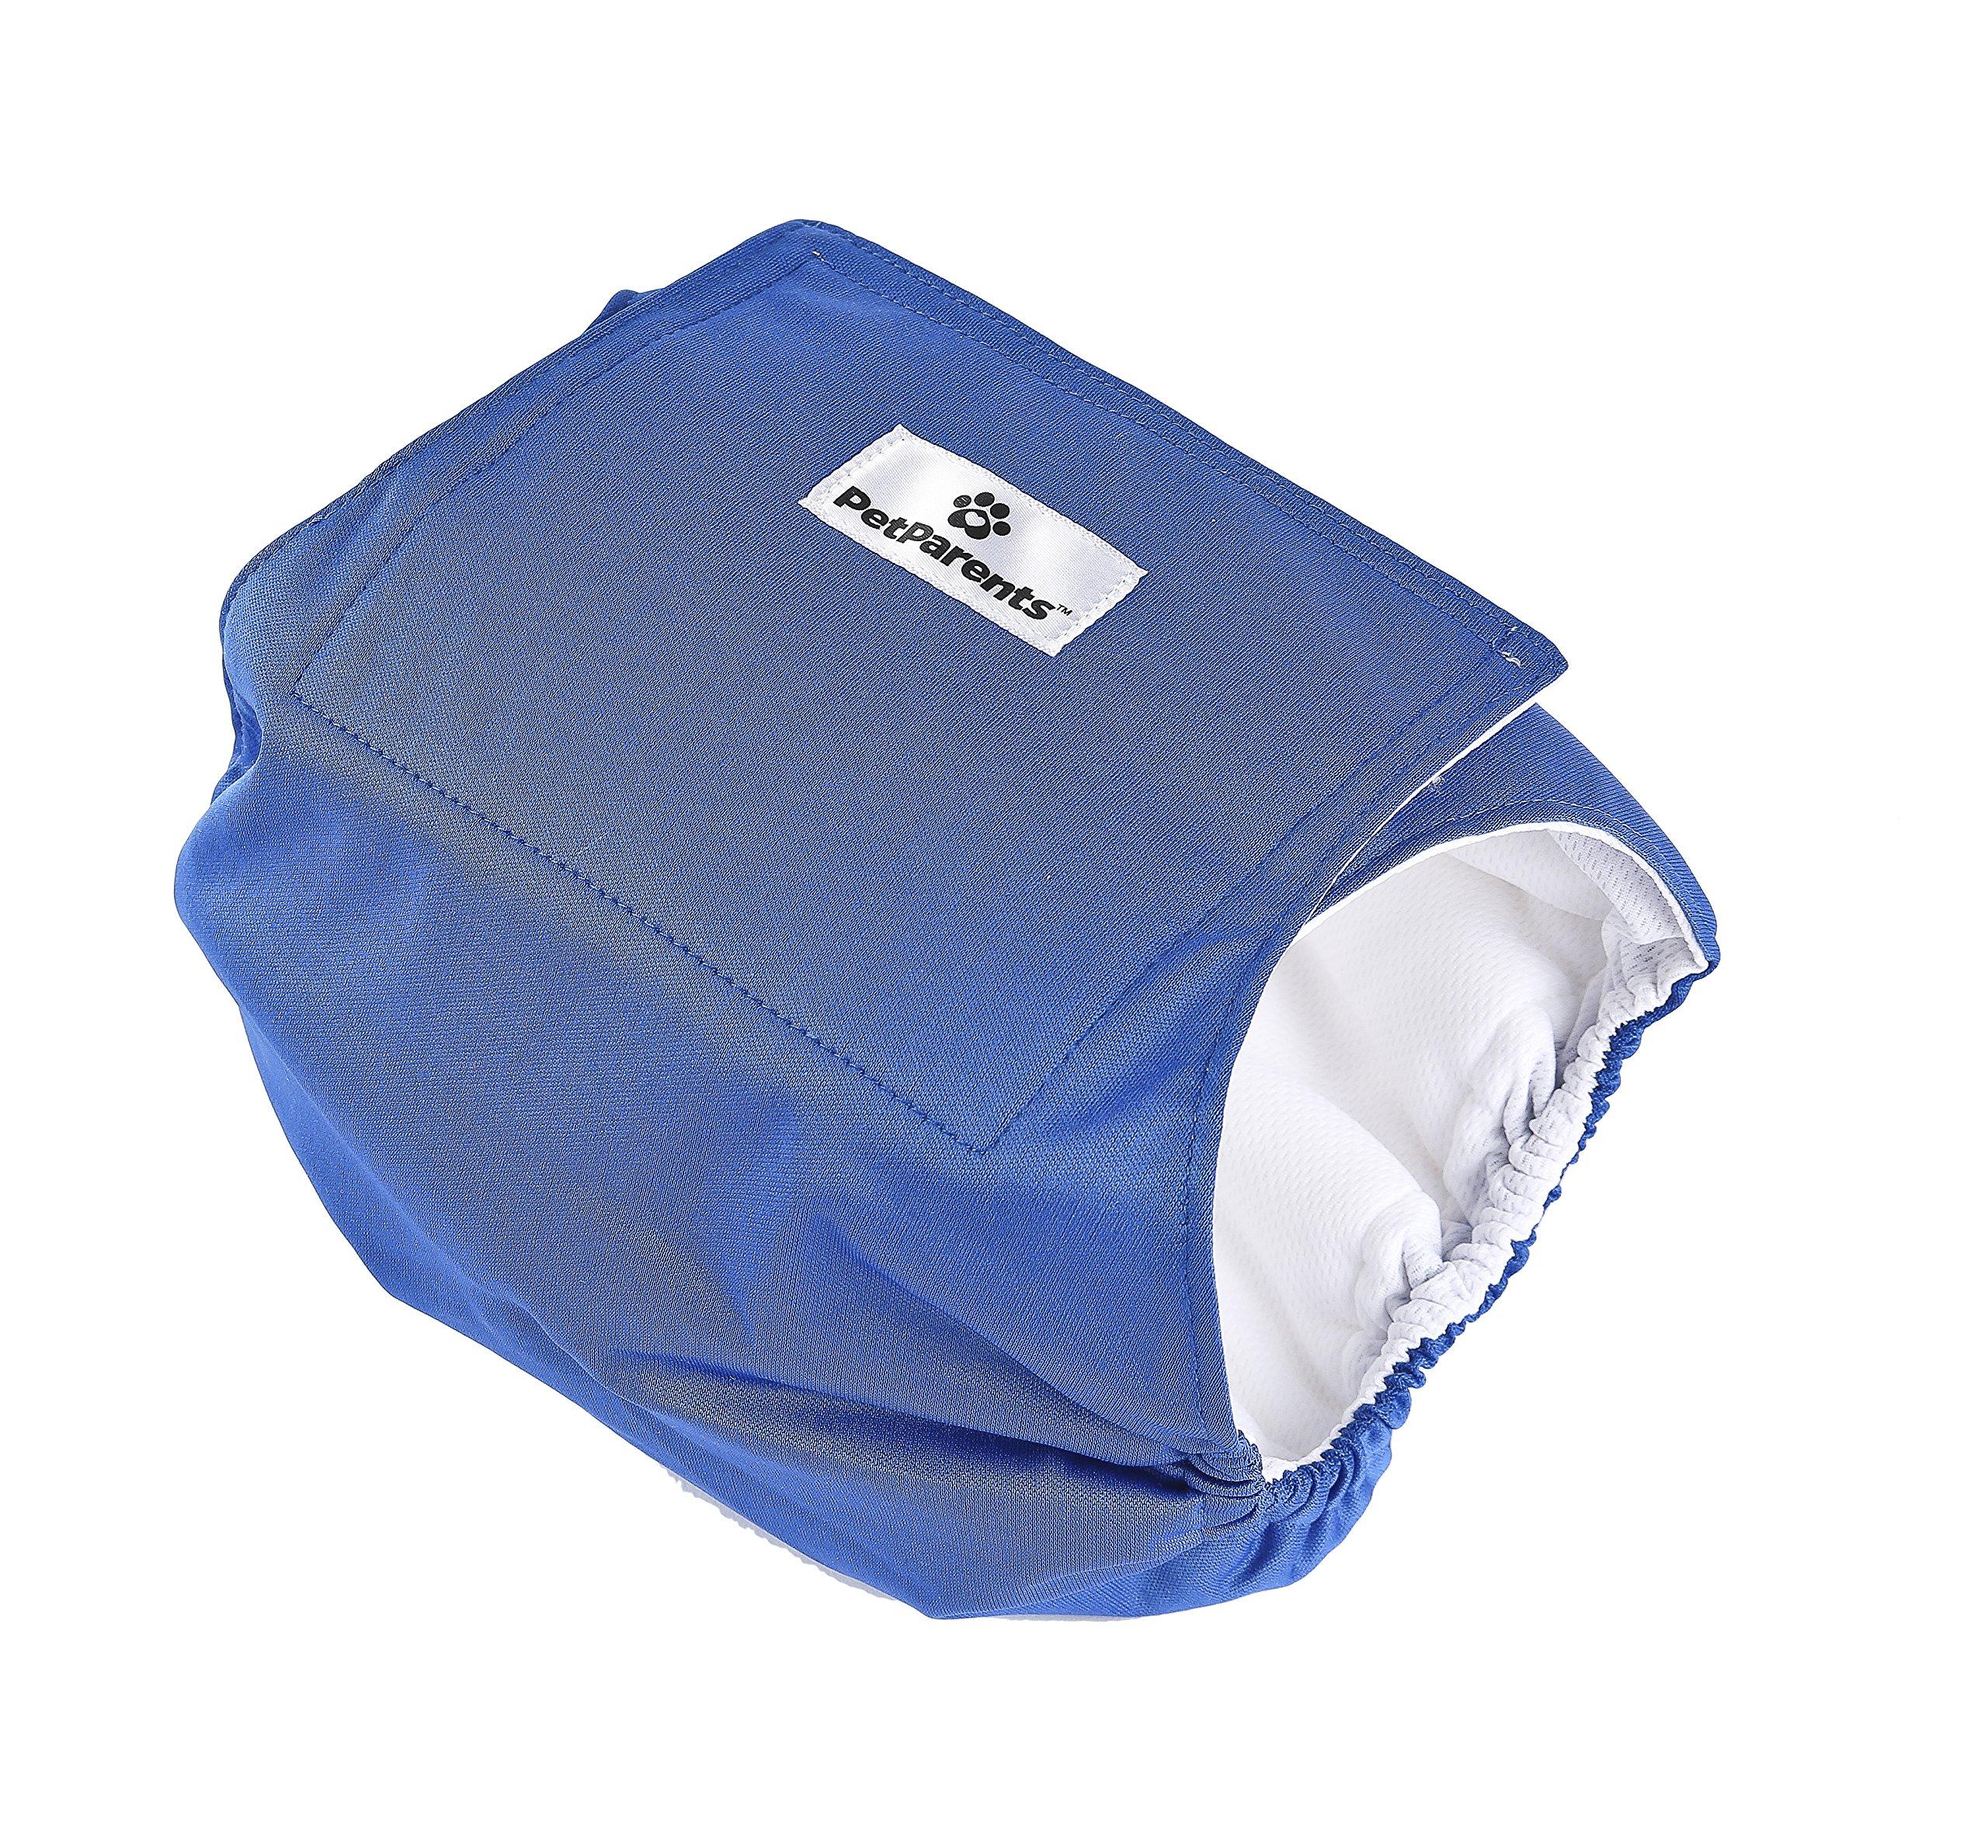 Pet Parents Premium Washable Dog Belly Band (3pack) of Male Dog Diapers, Color: Gentlemen, Size: Medium Dog Wraps by Pet Parents (Image #3)